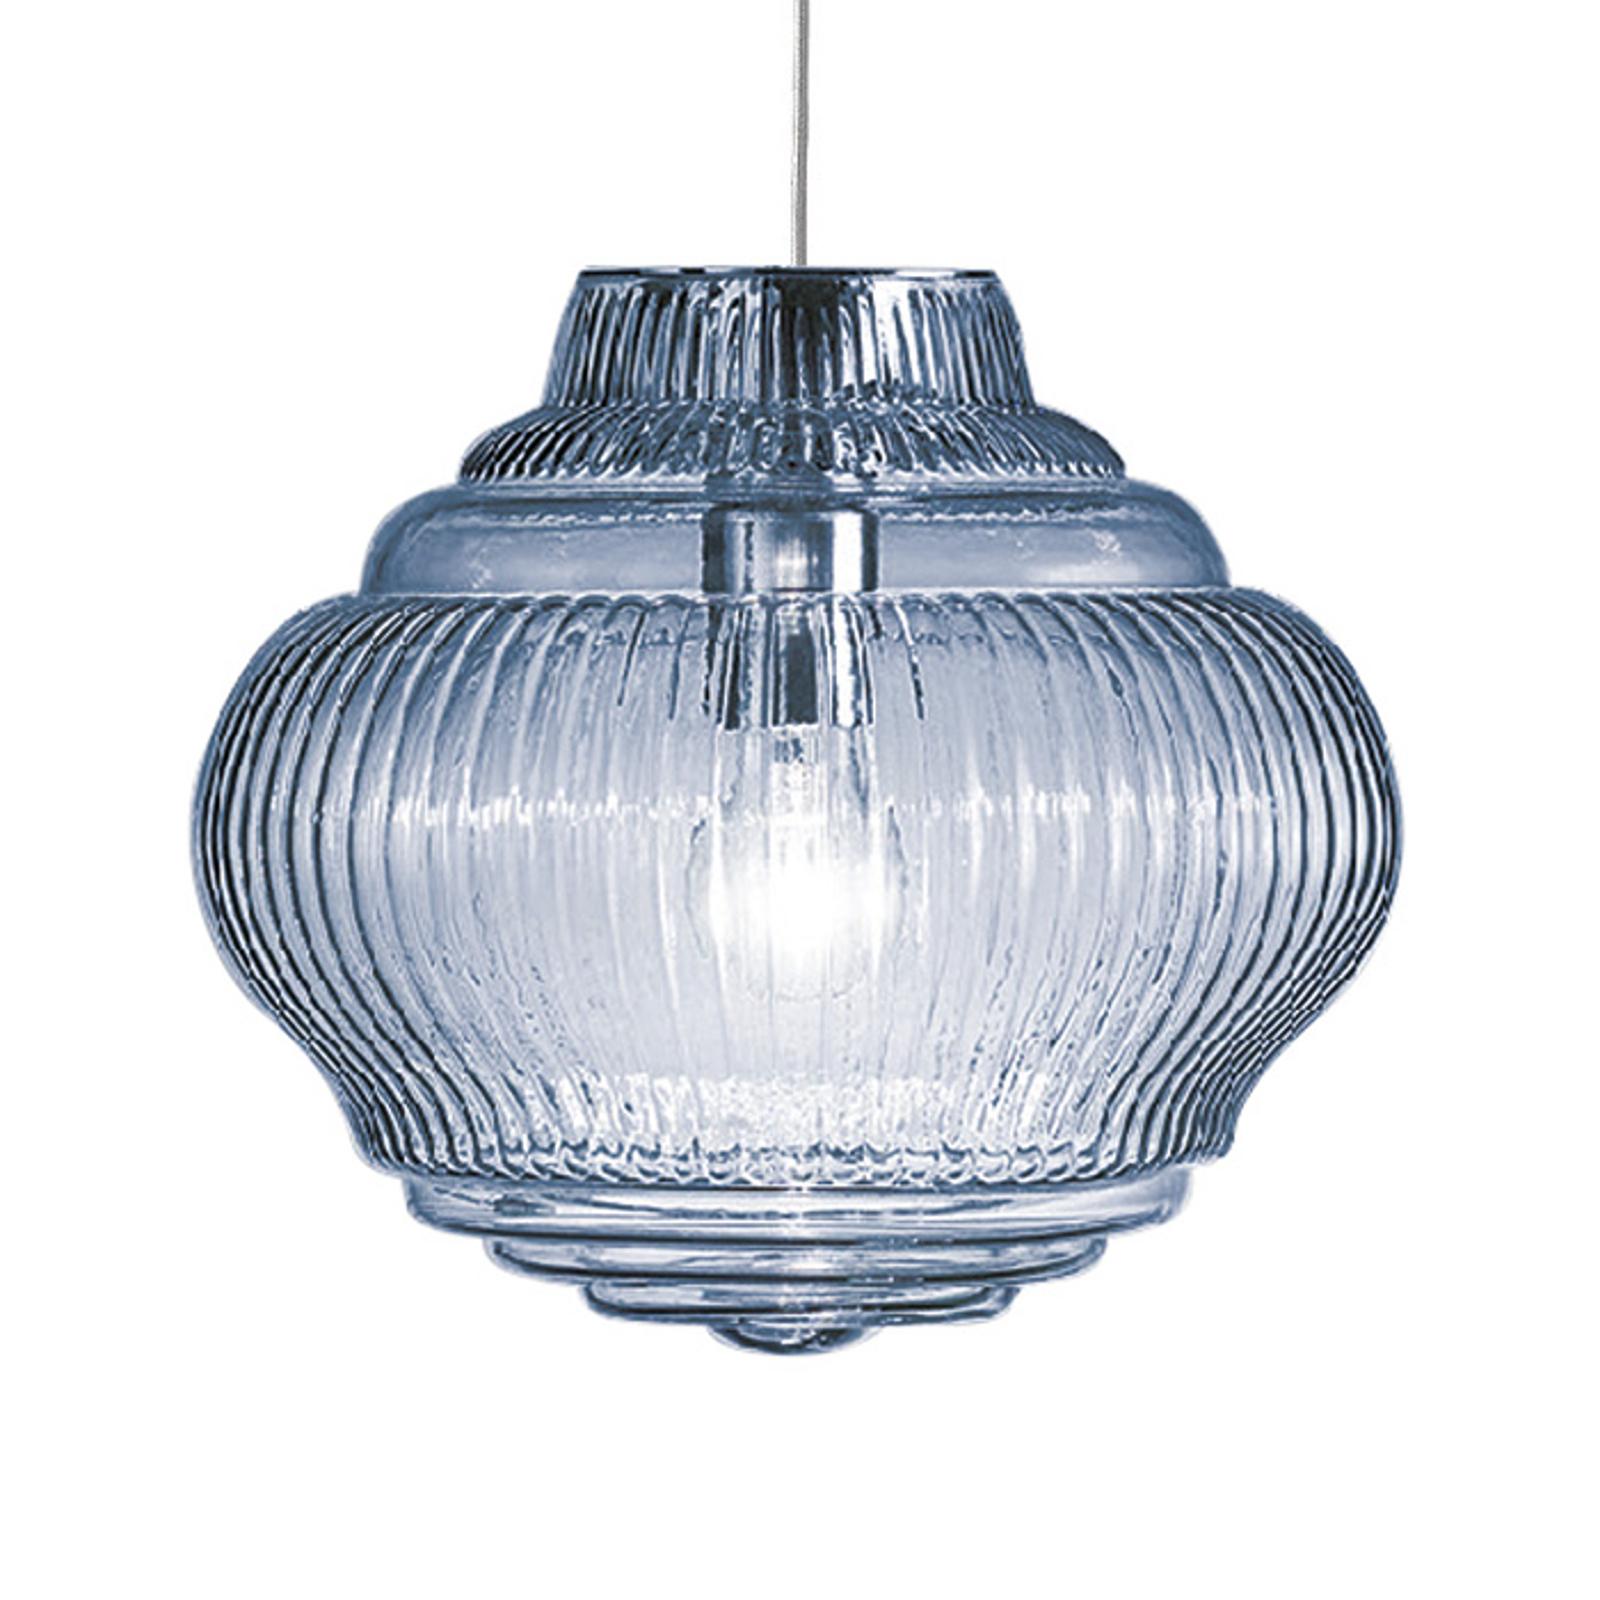 Lampada a sospensione Bonnie 130 cm celeste